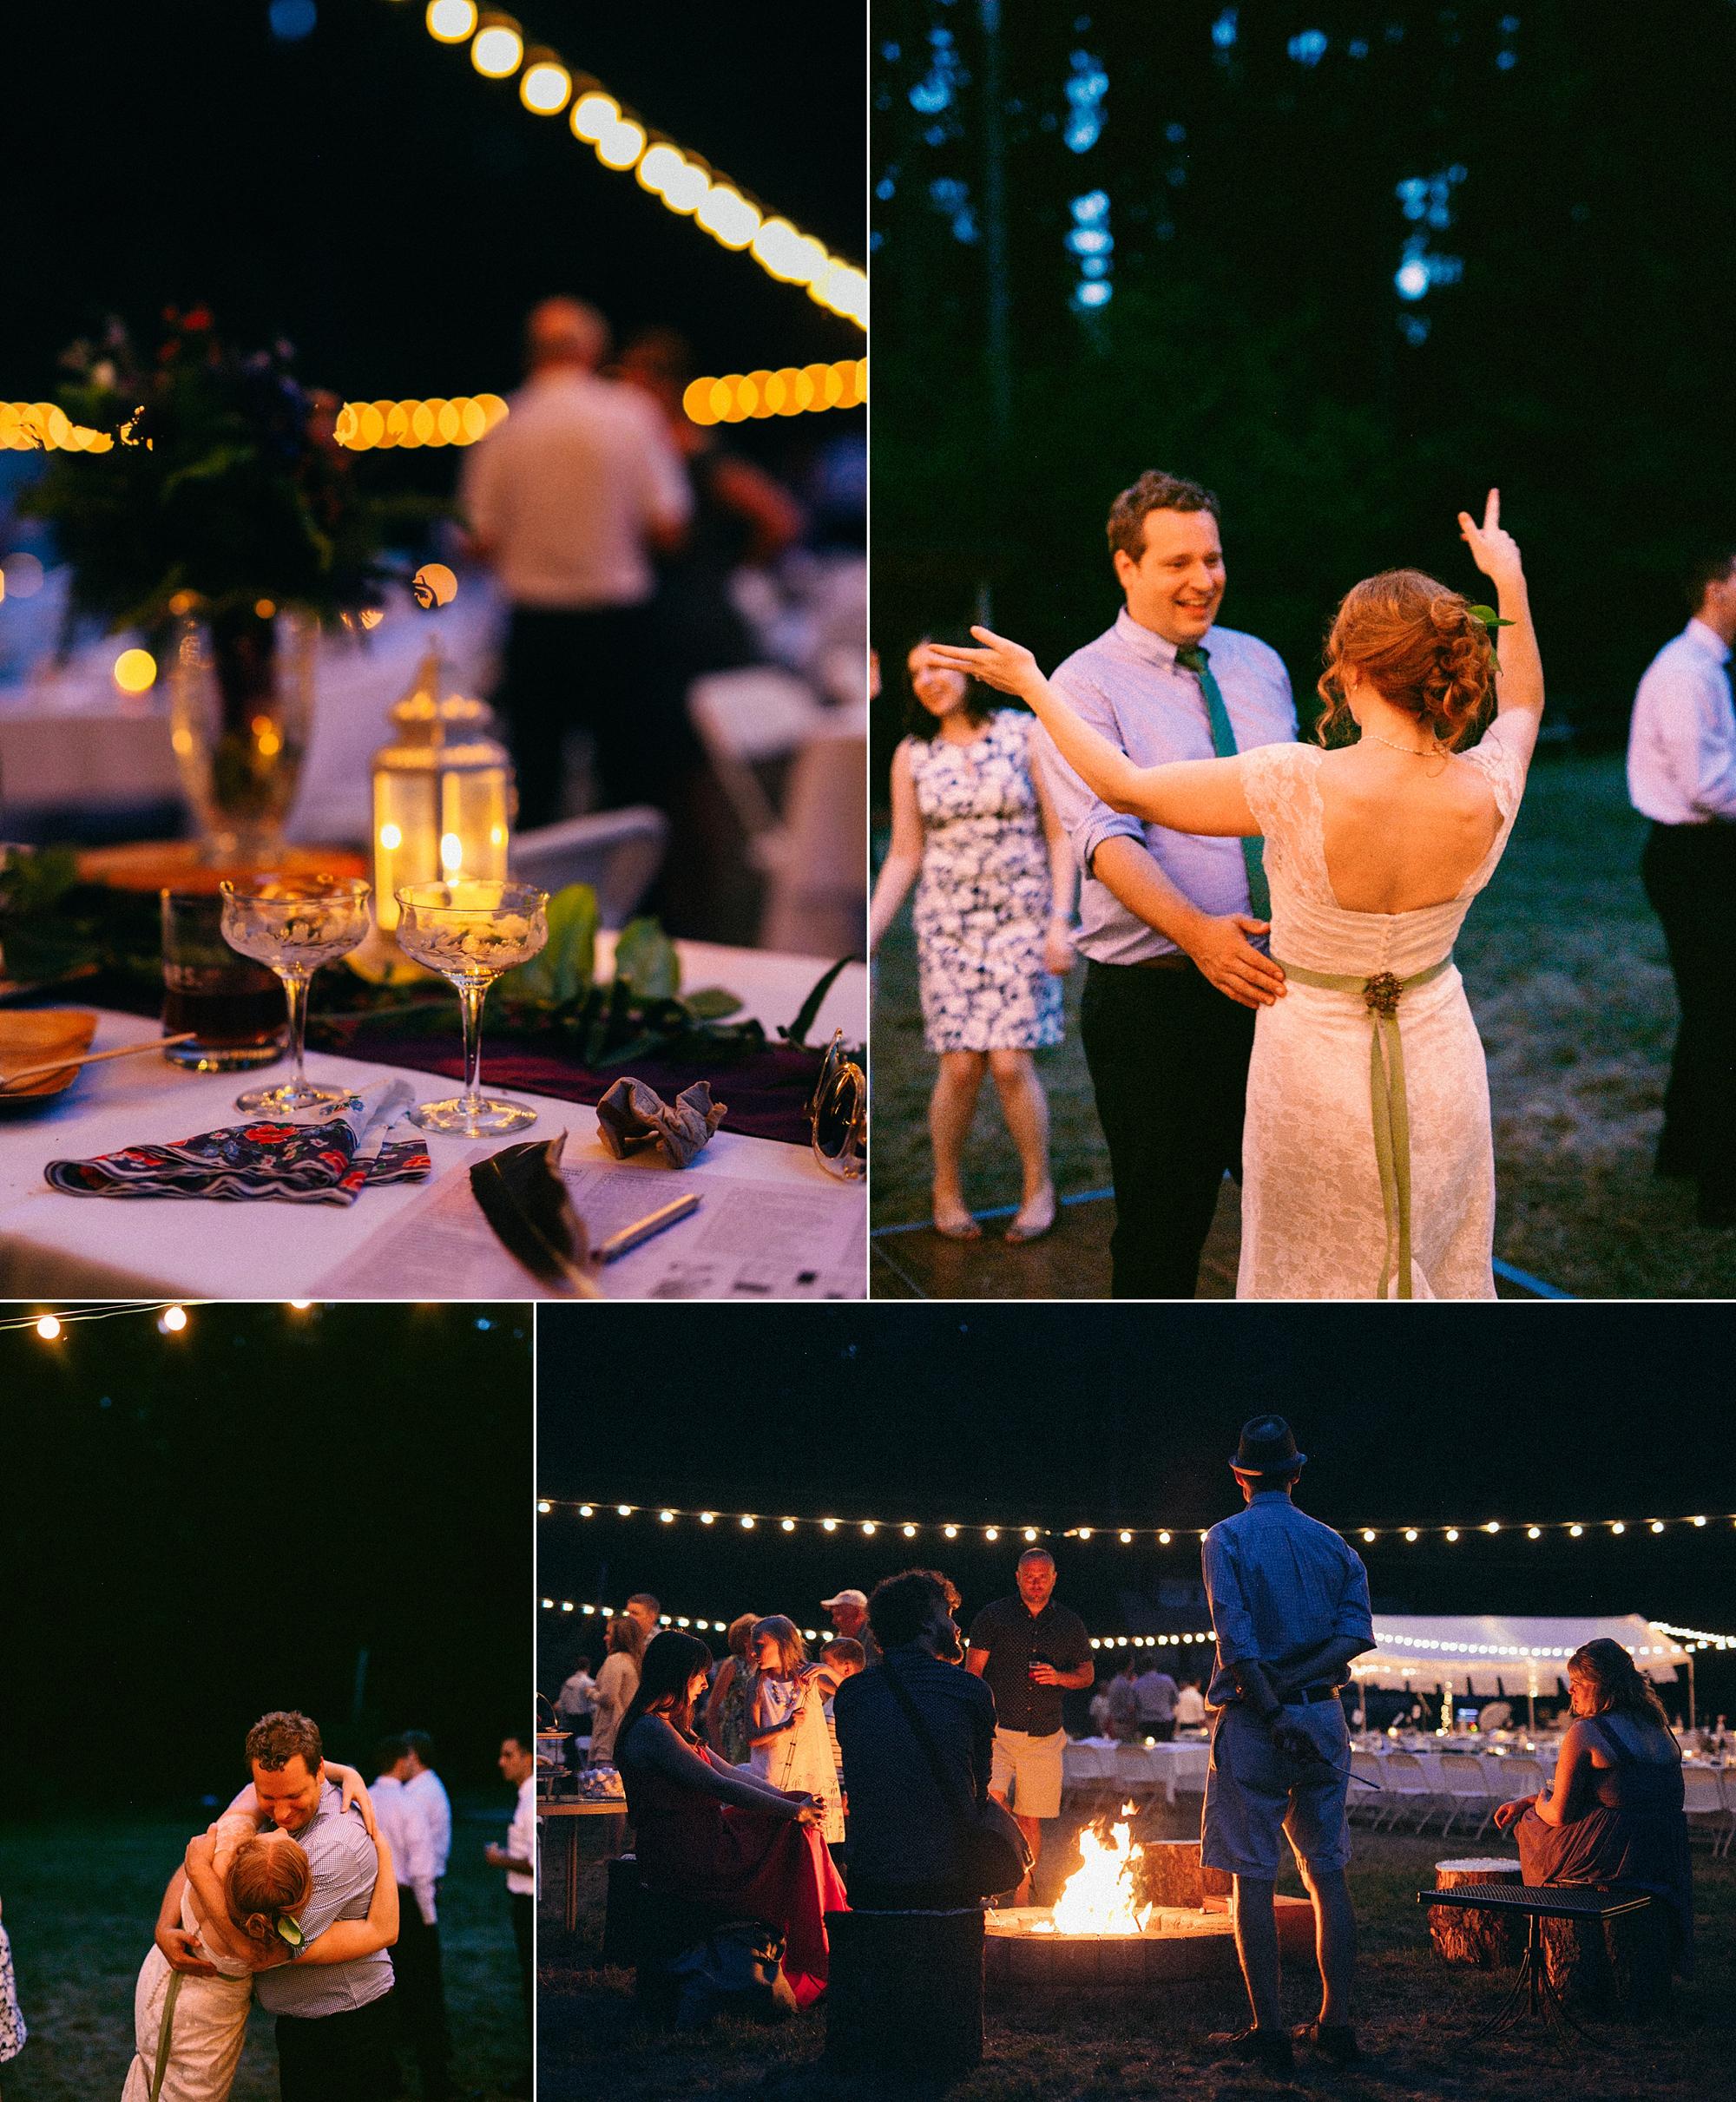 ashley vos photography seattle area wedding photographer_0718.jpg